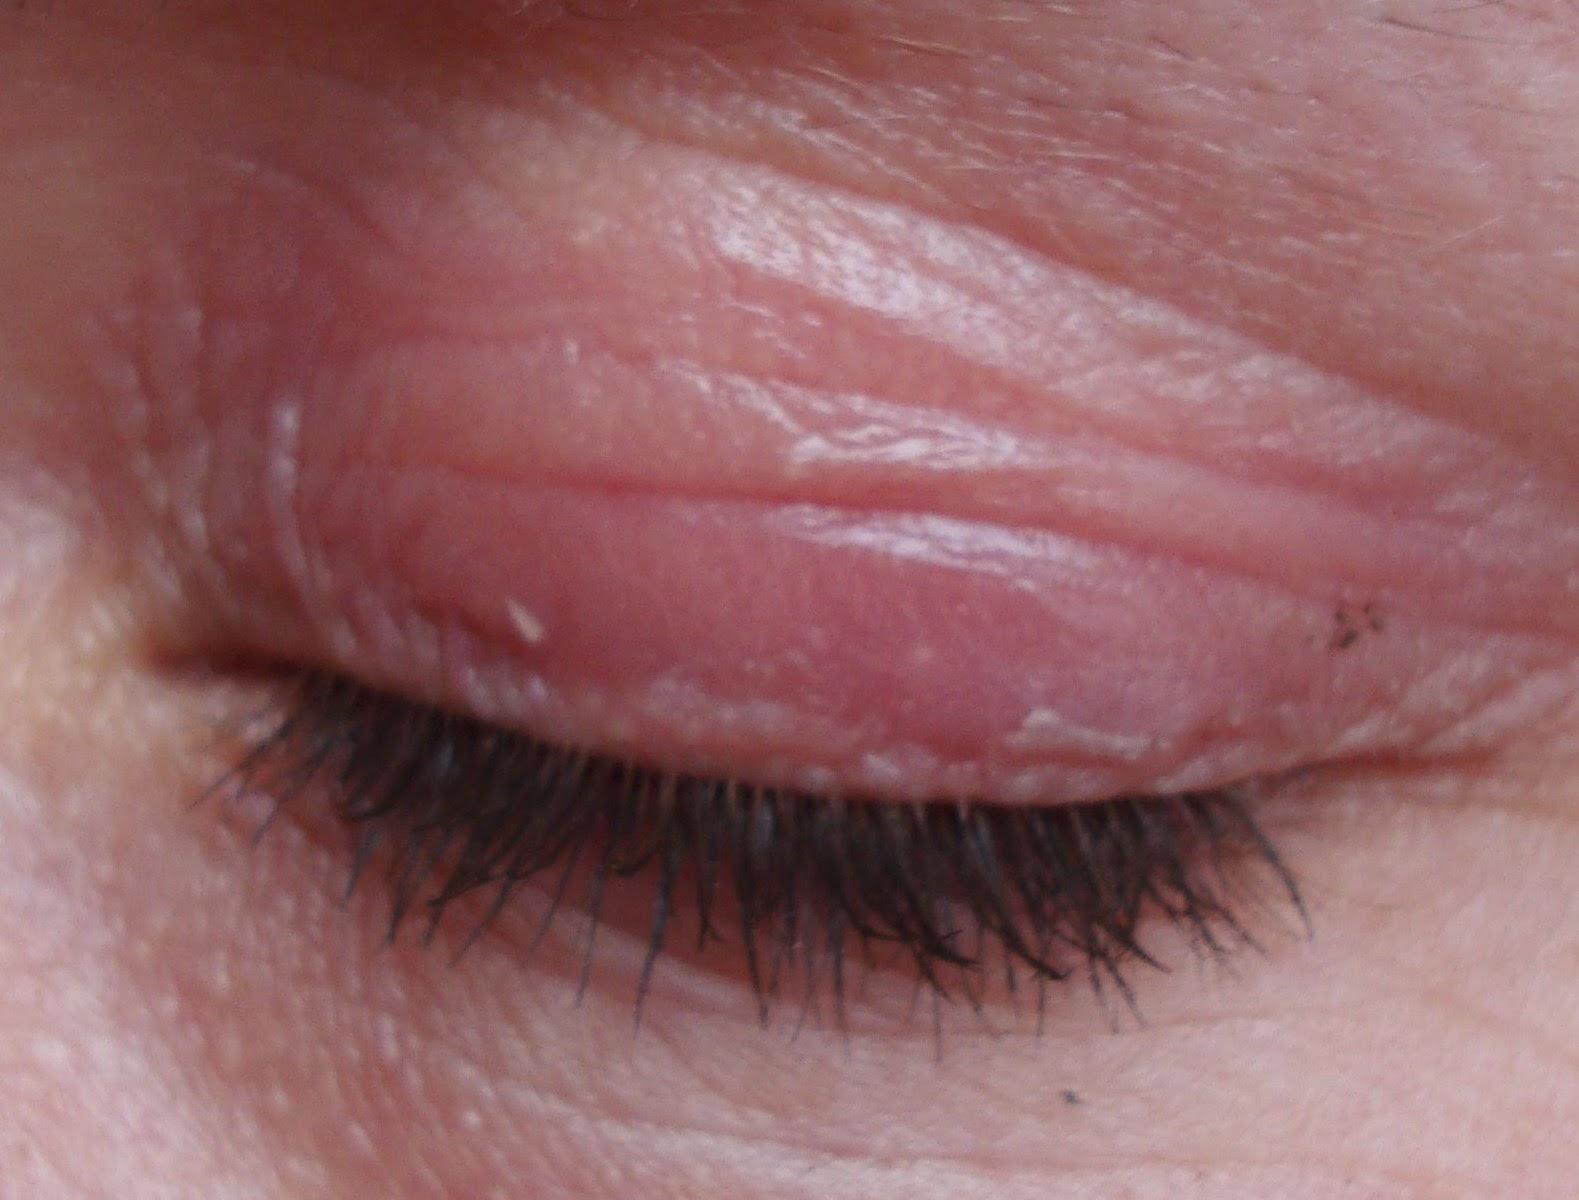 oogallergie